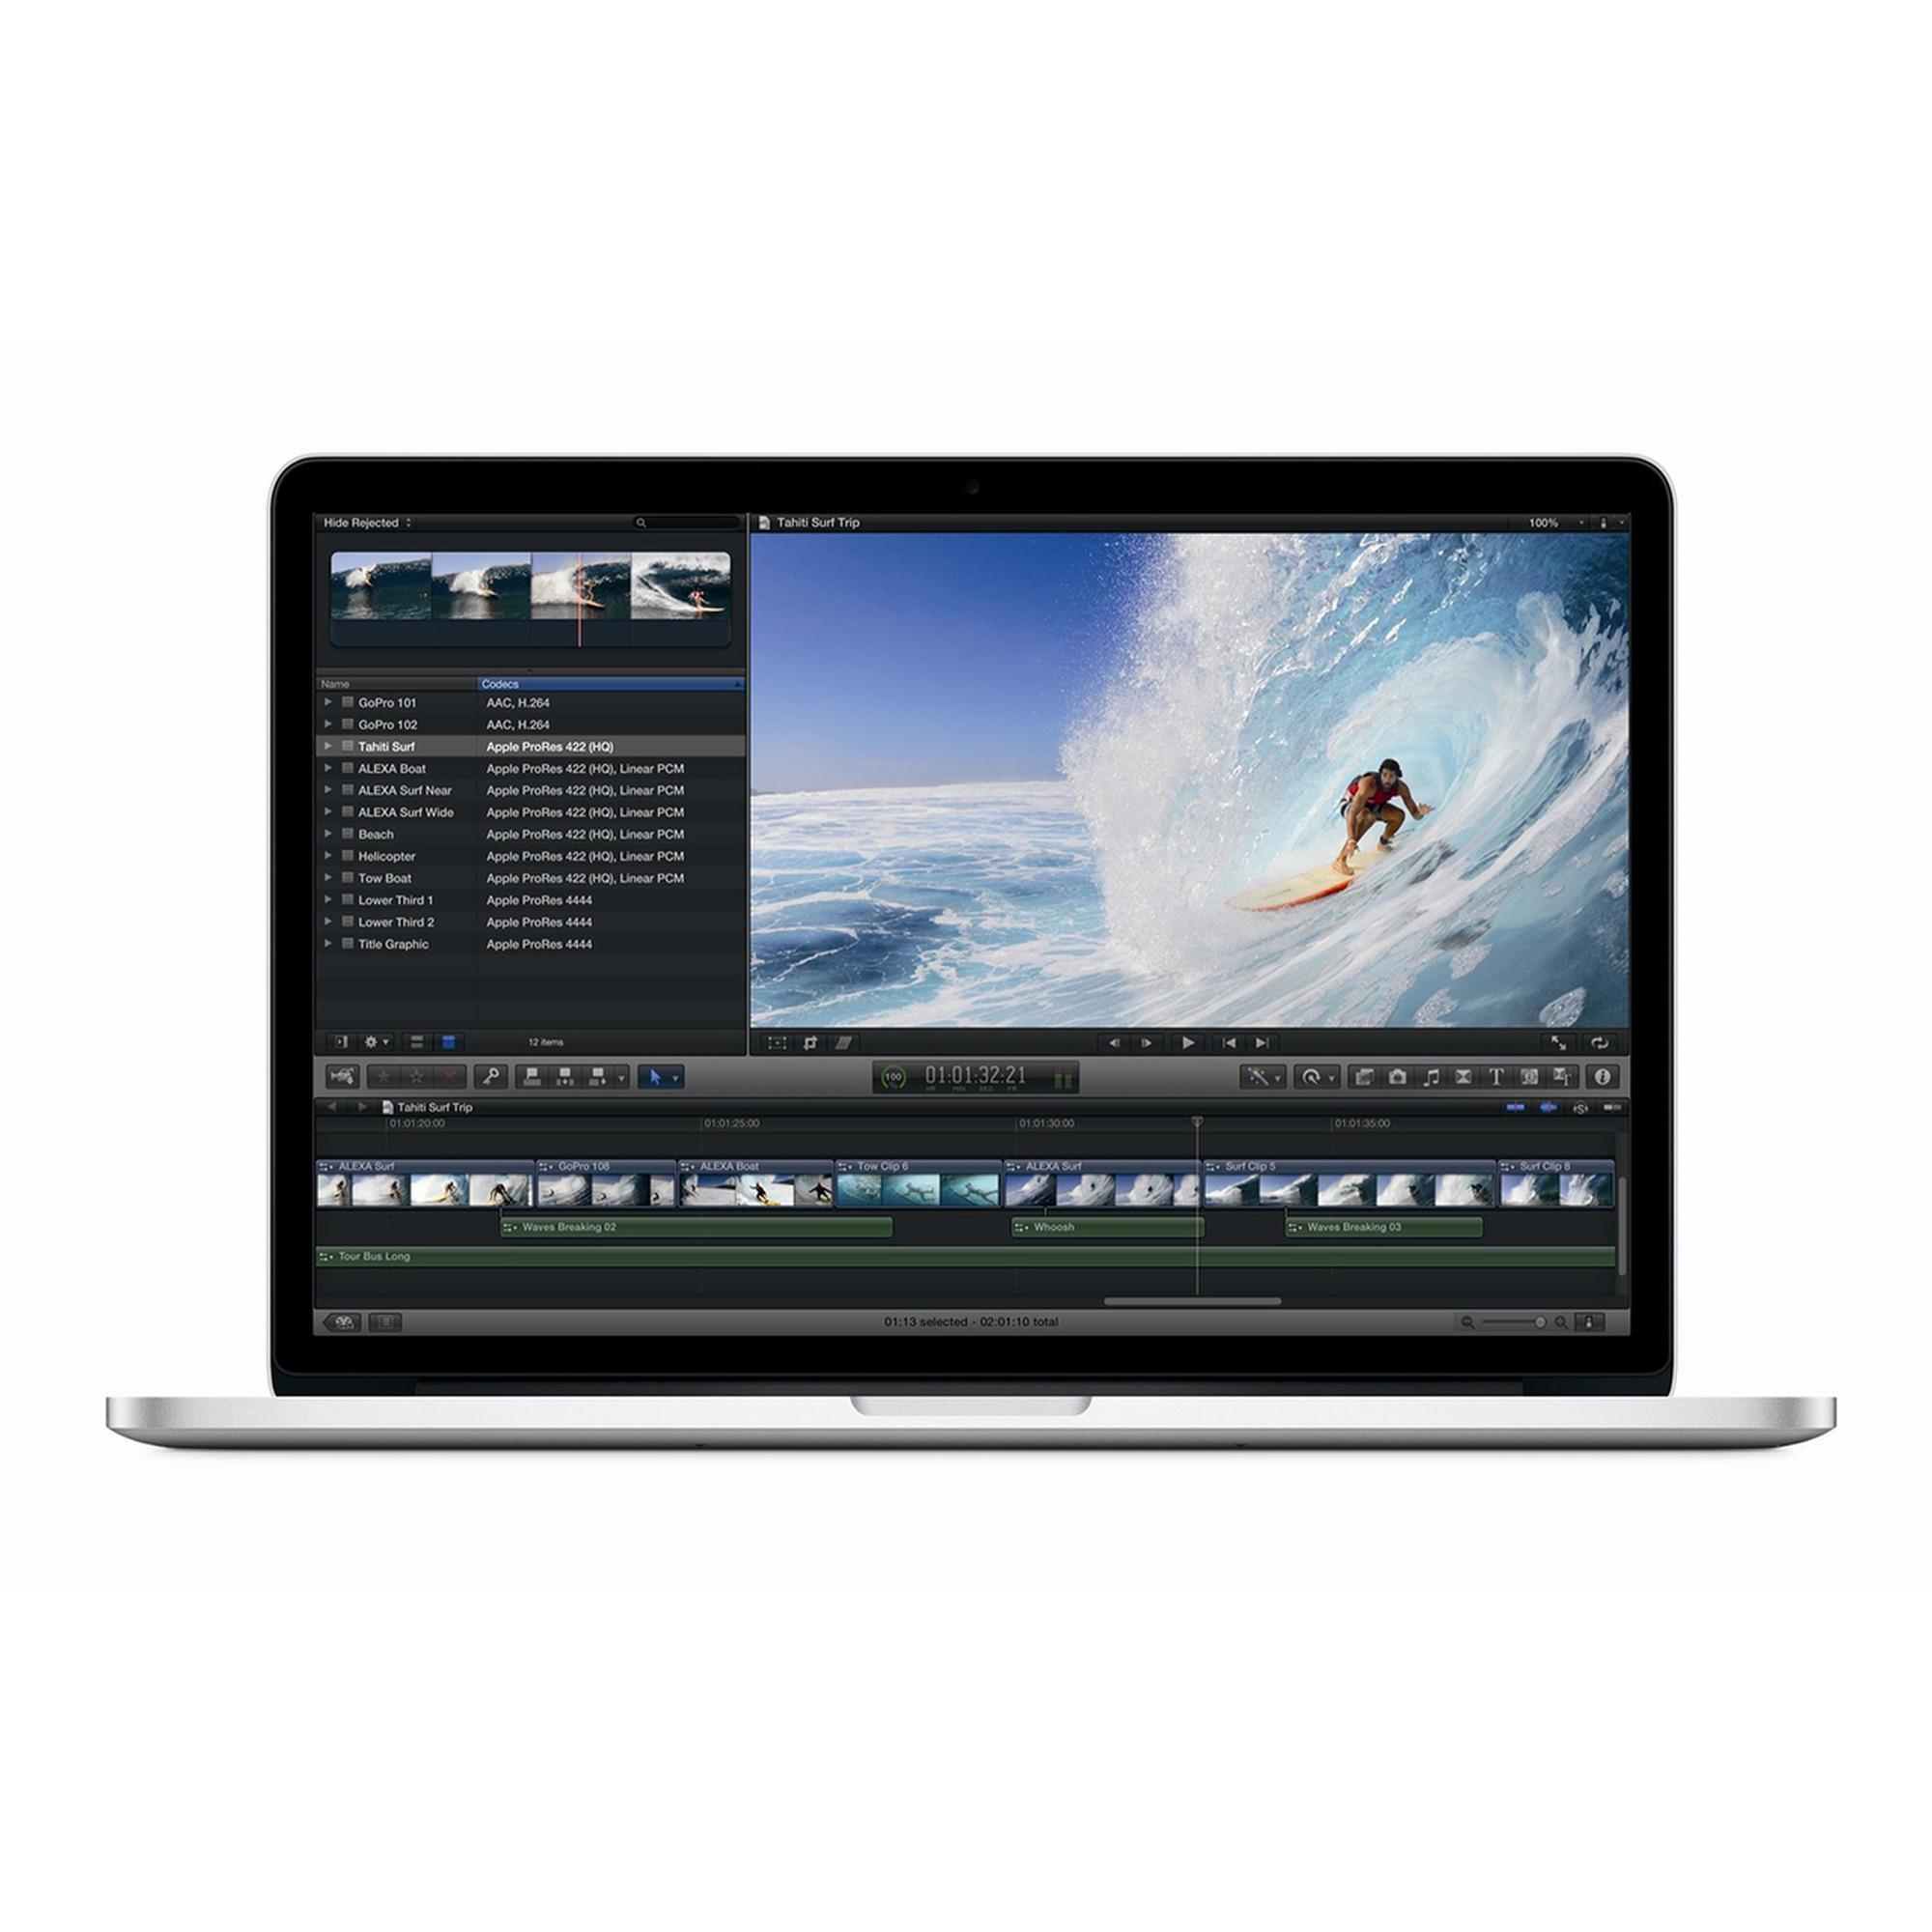 "MacBook Pro 15"" Retina (2014) - Core i7 2,5 GHz - SSD 512 GB - 16GB - QWERTY - Englanti (US)"